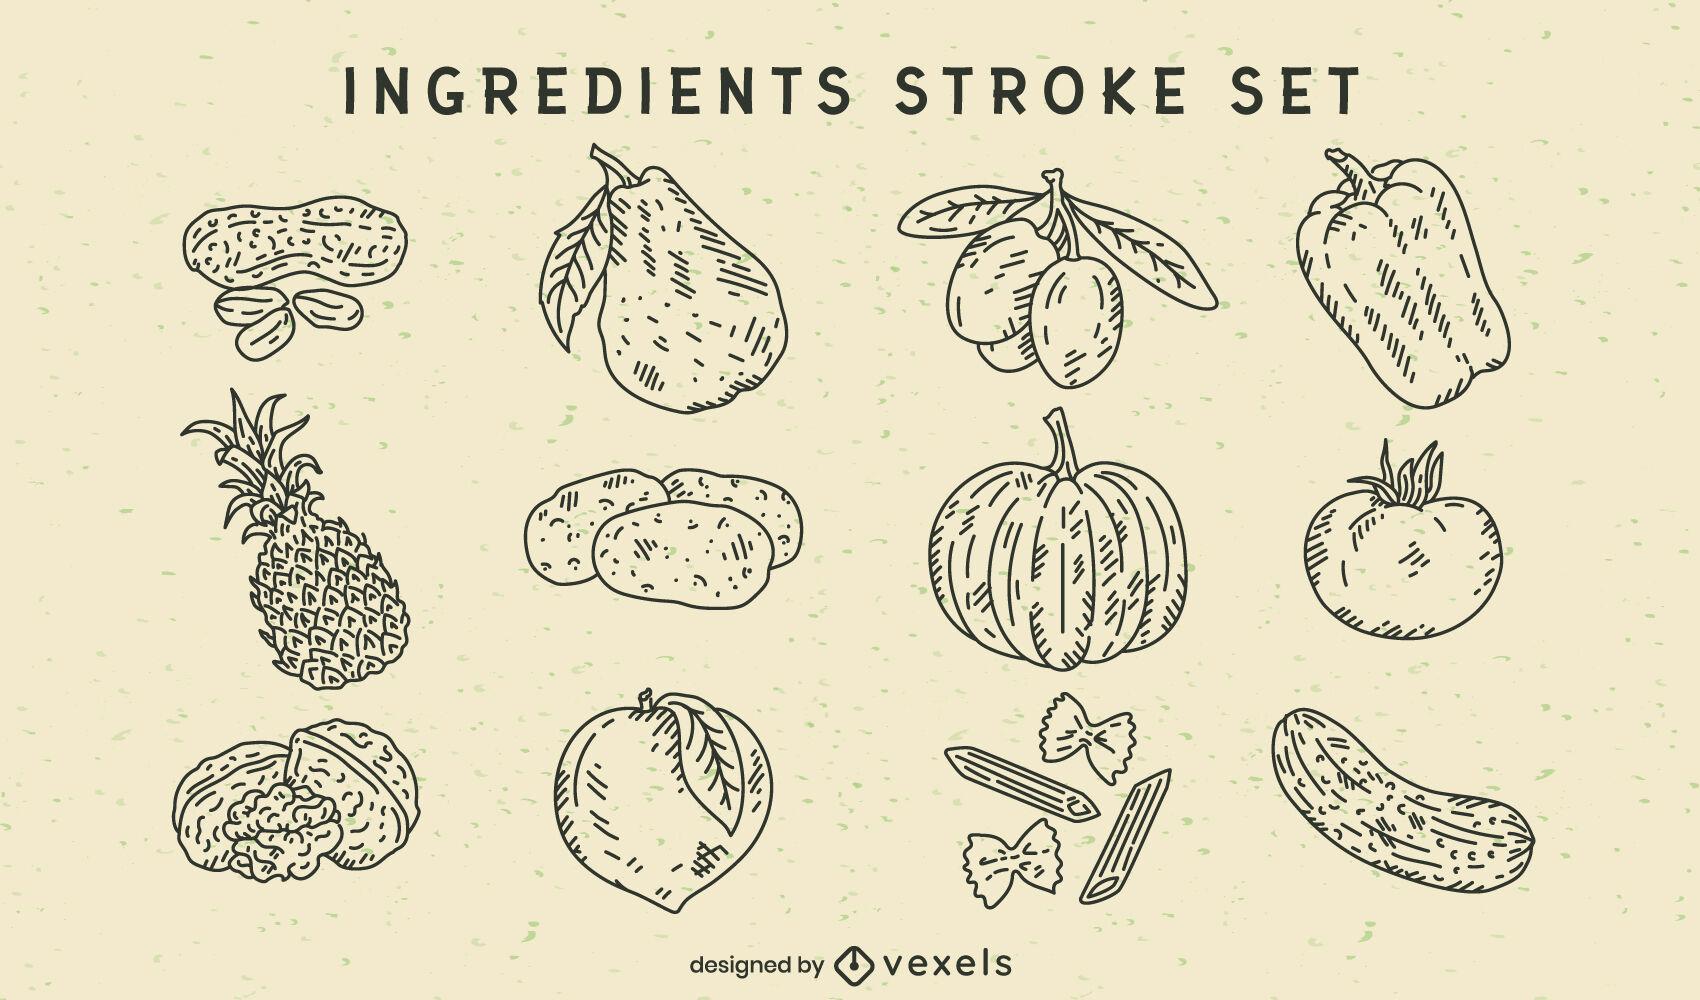 Vegetables and fruits ingredients set